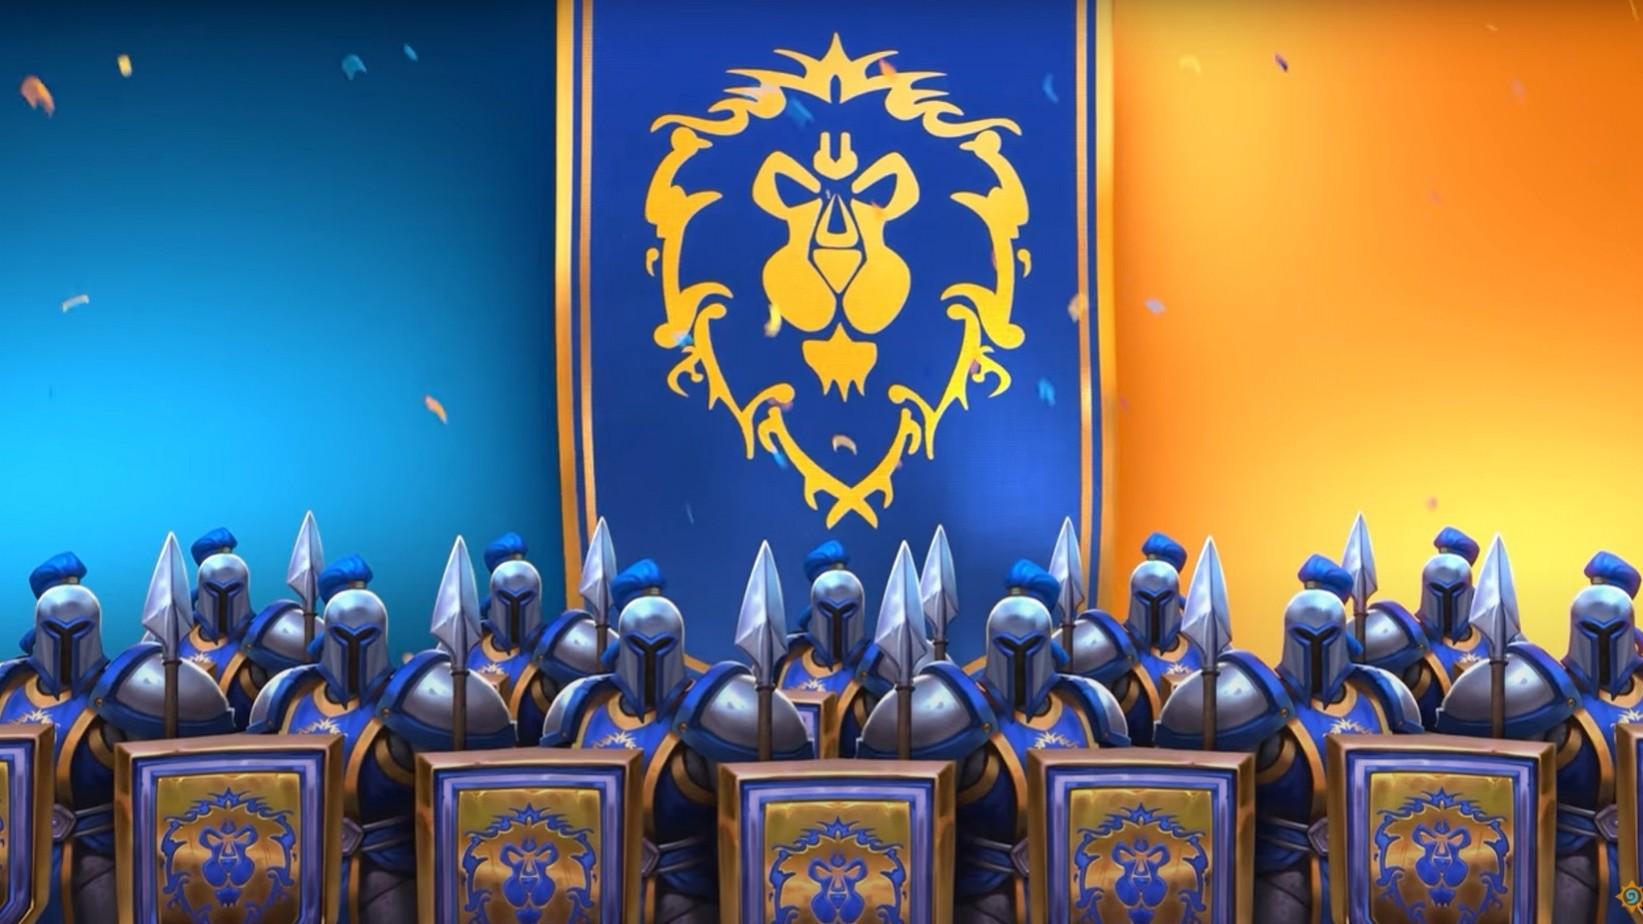 Blizzard объявила дату анонса нового дополнения в Hearthstone